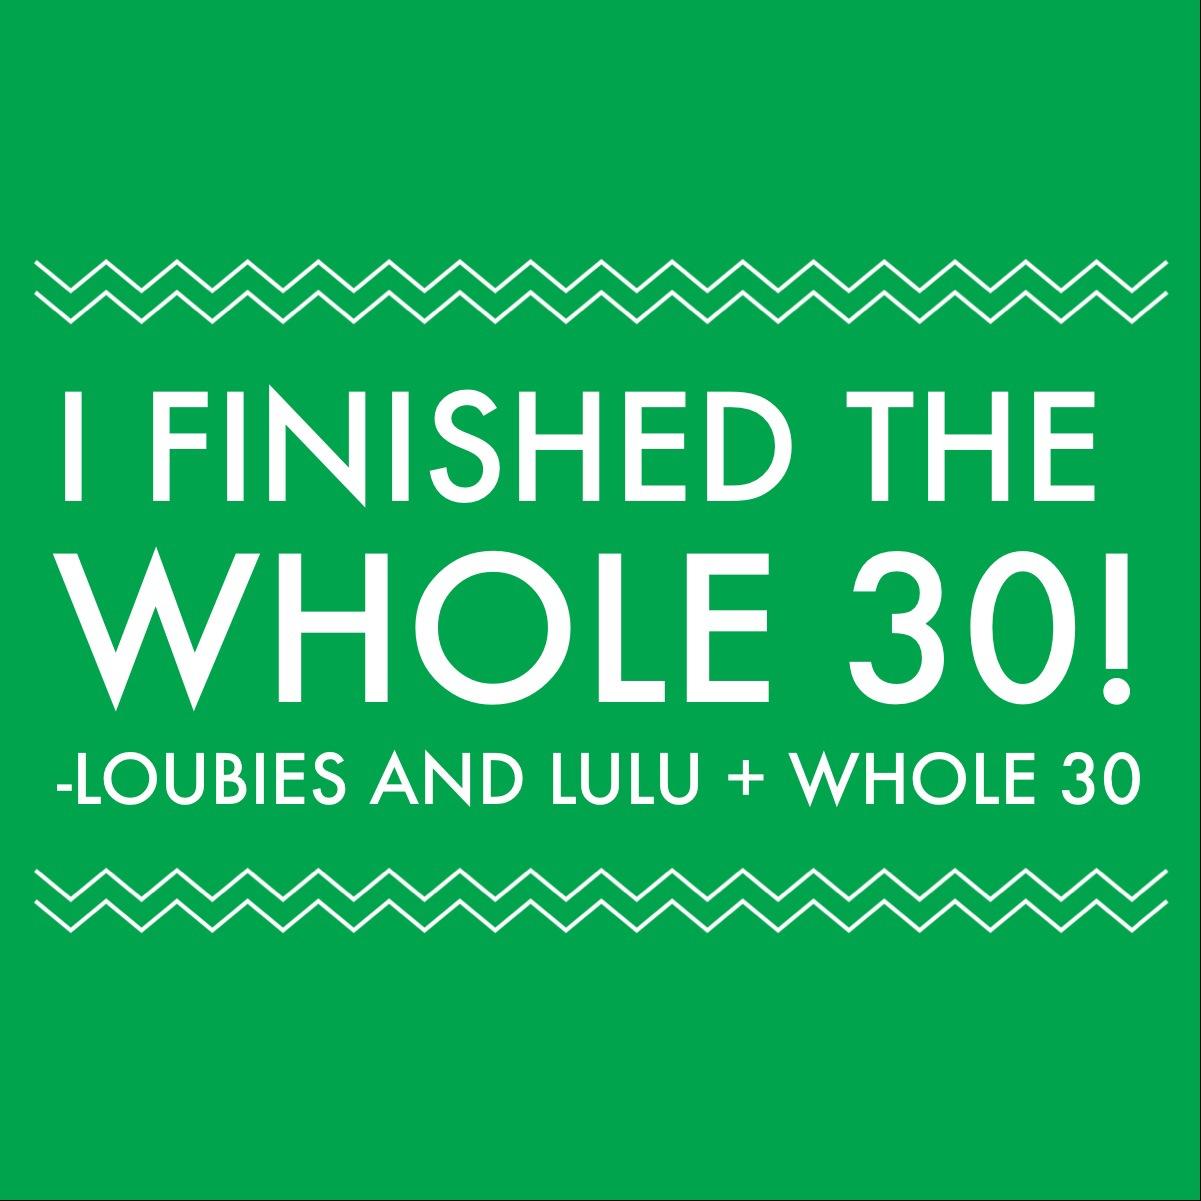 WHOLE 30 RECAP